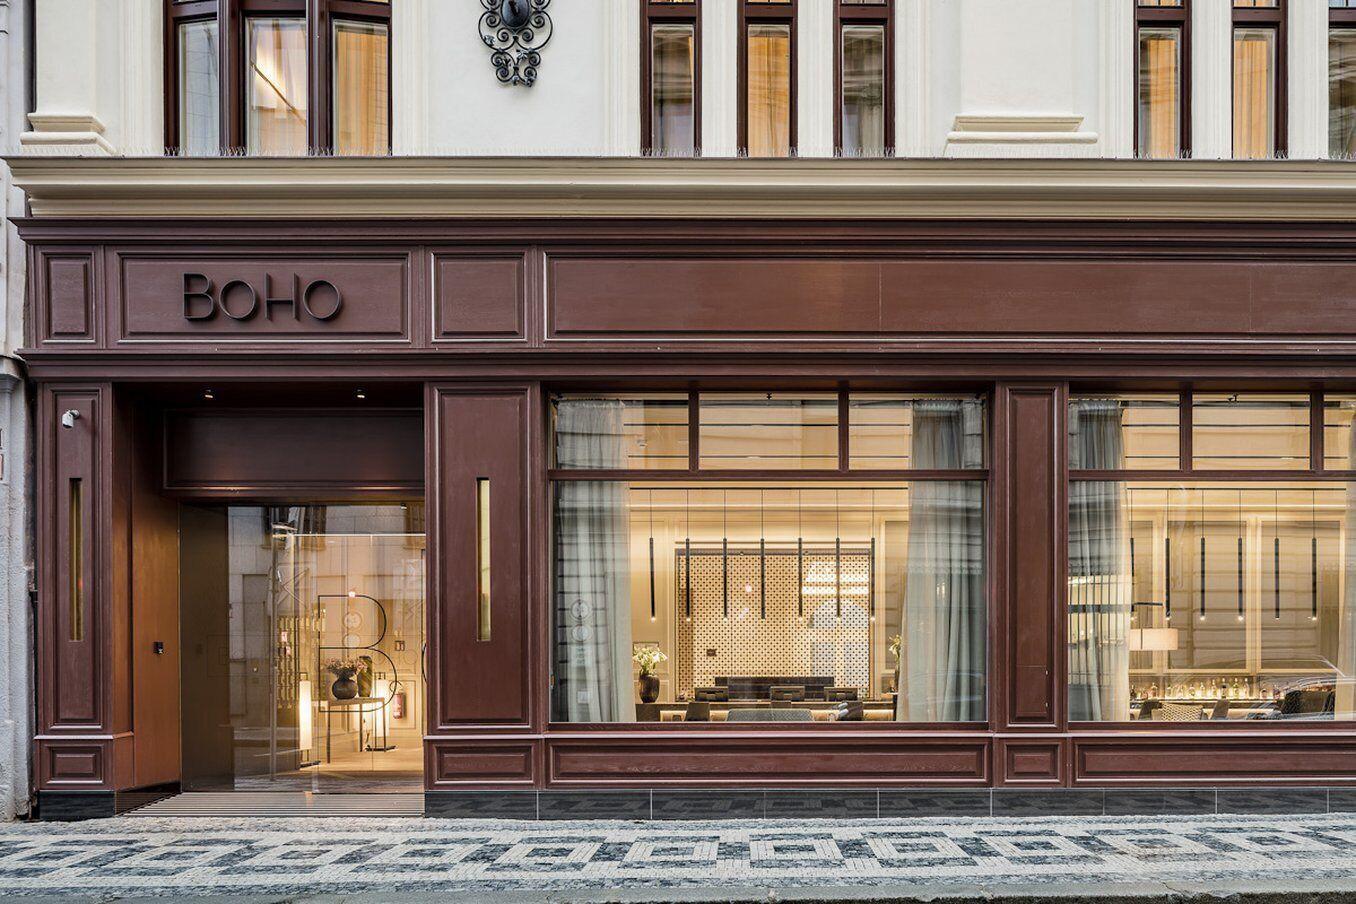 Courtesy of BoHo Prague Hotel / Expedia